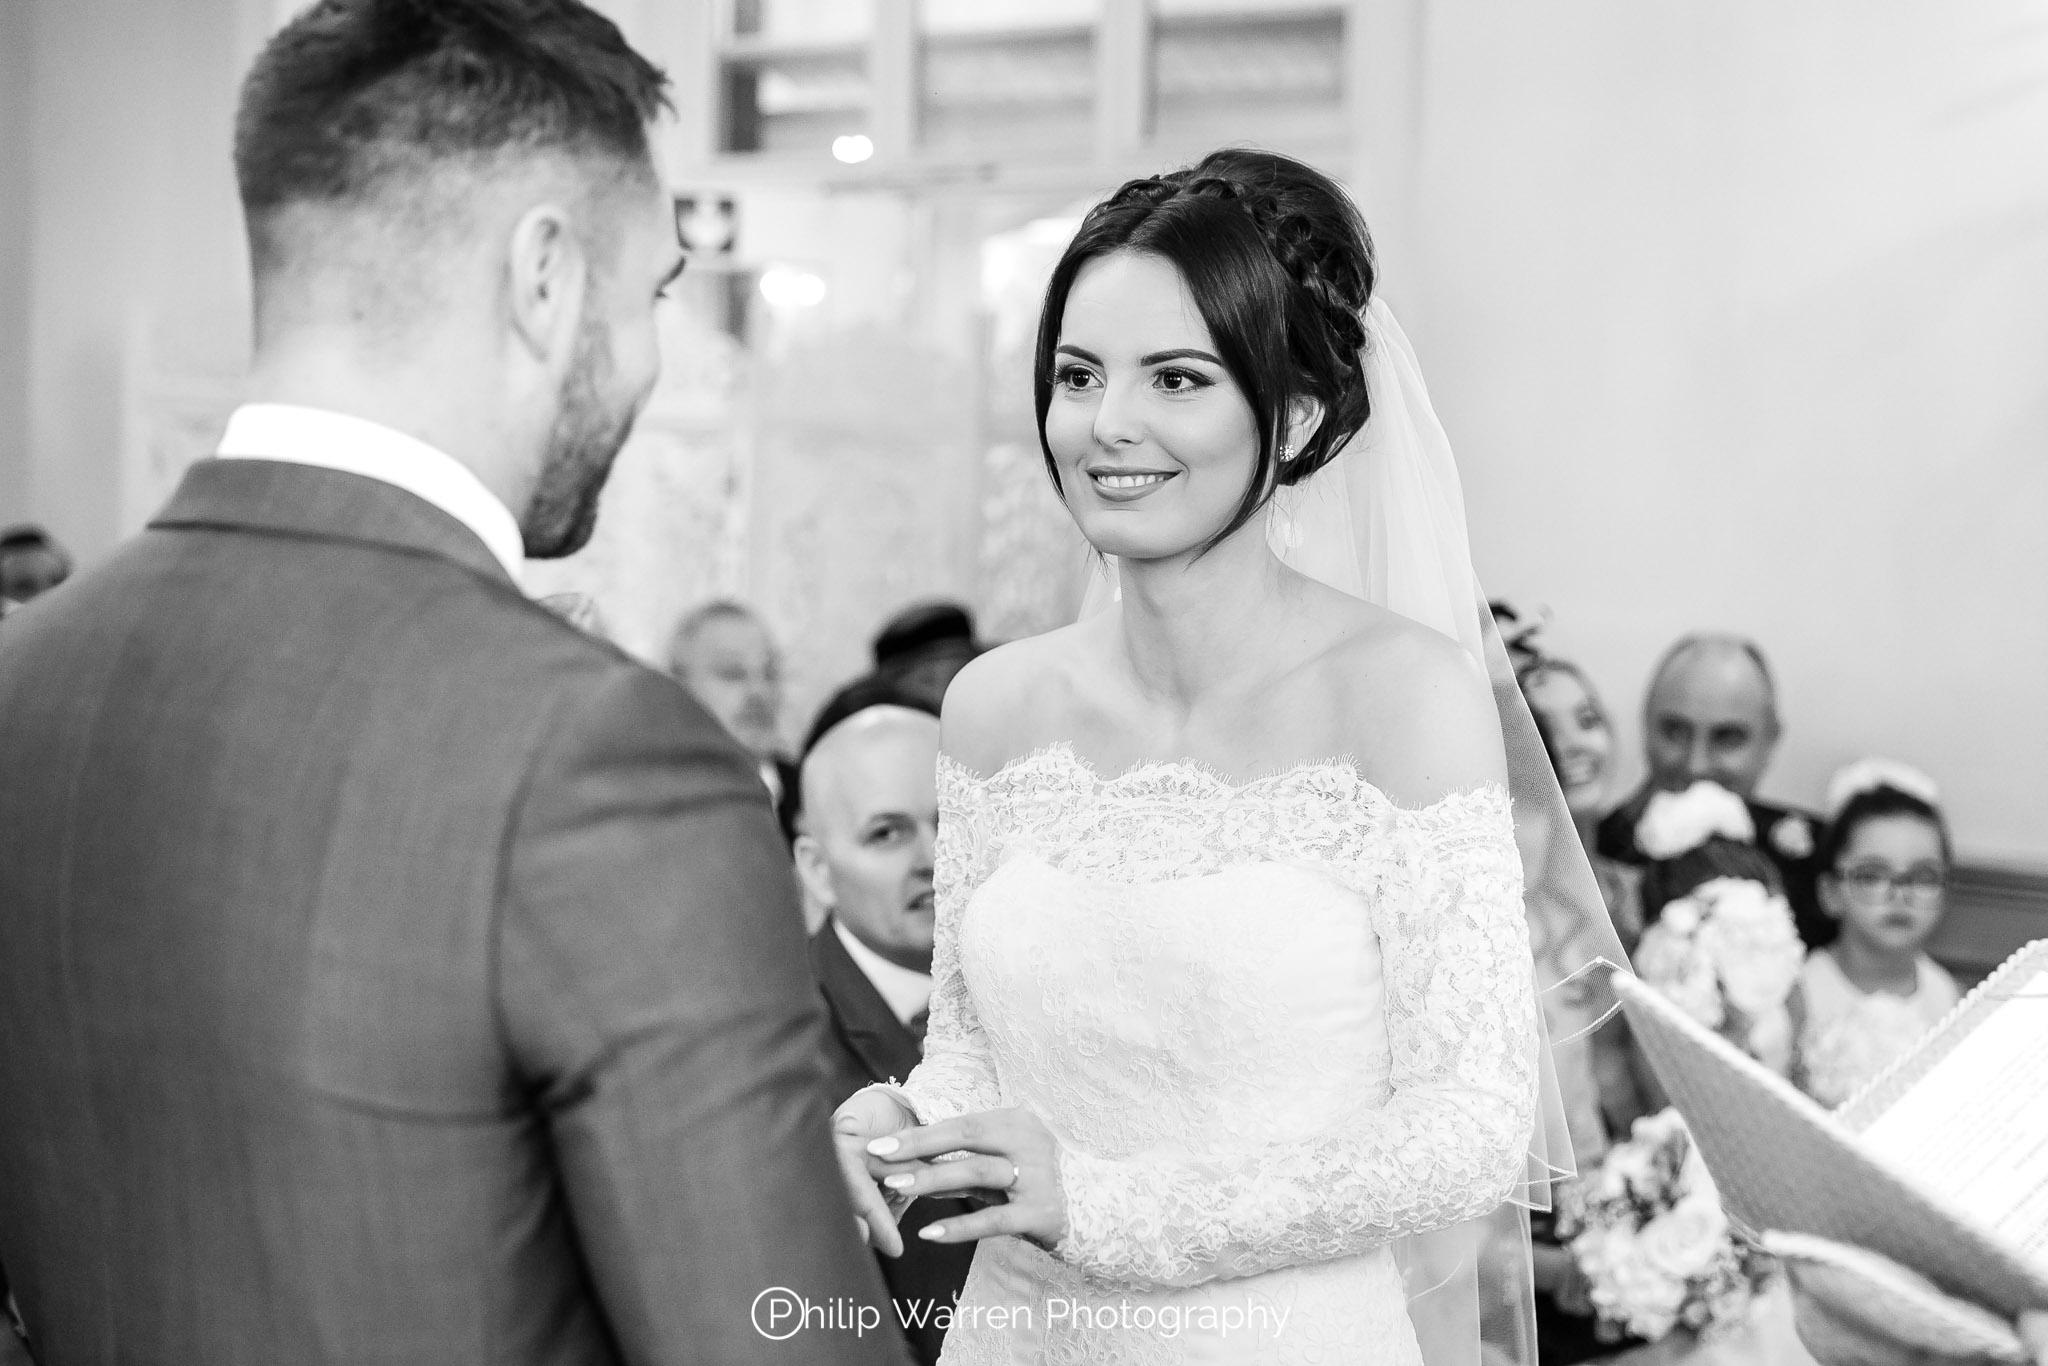 Wedding Ceremony at Bryngarw House